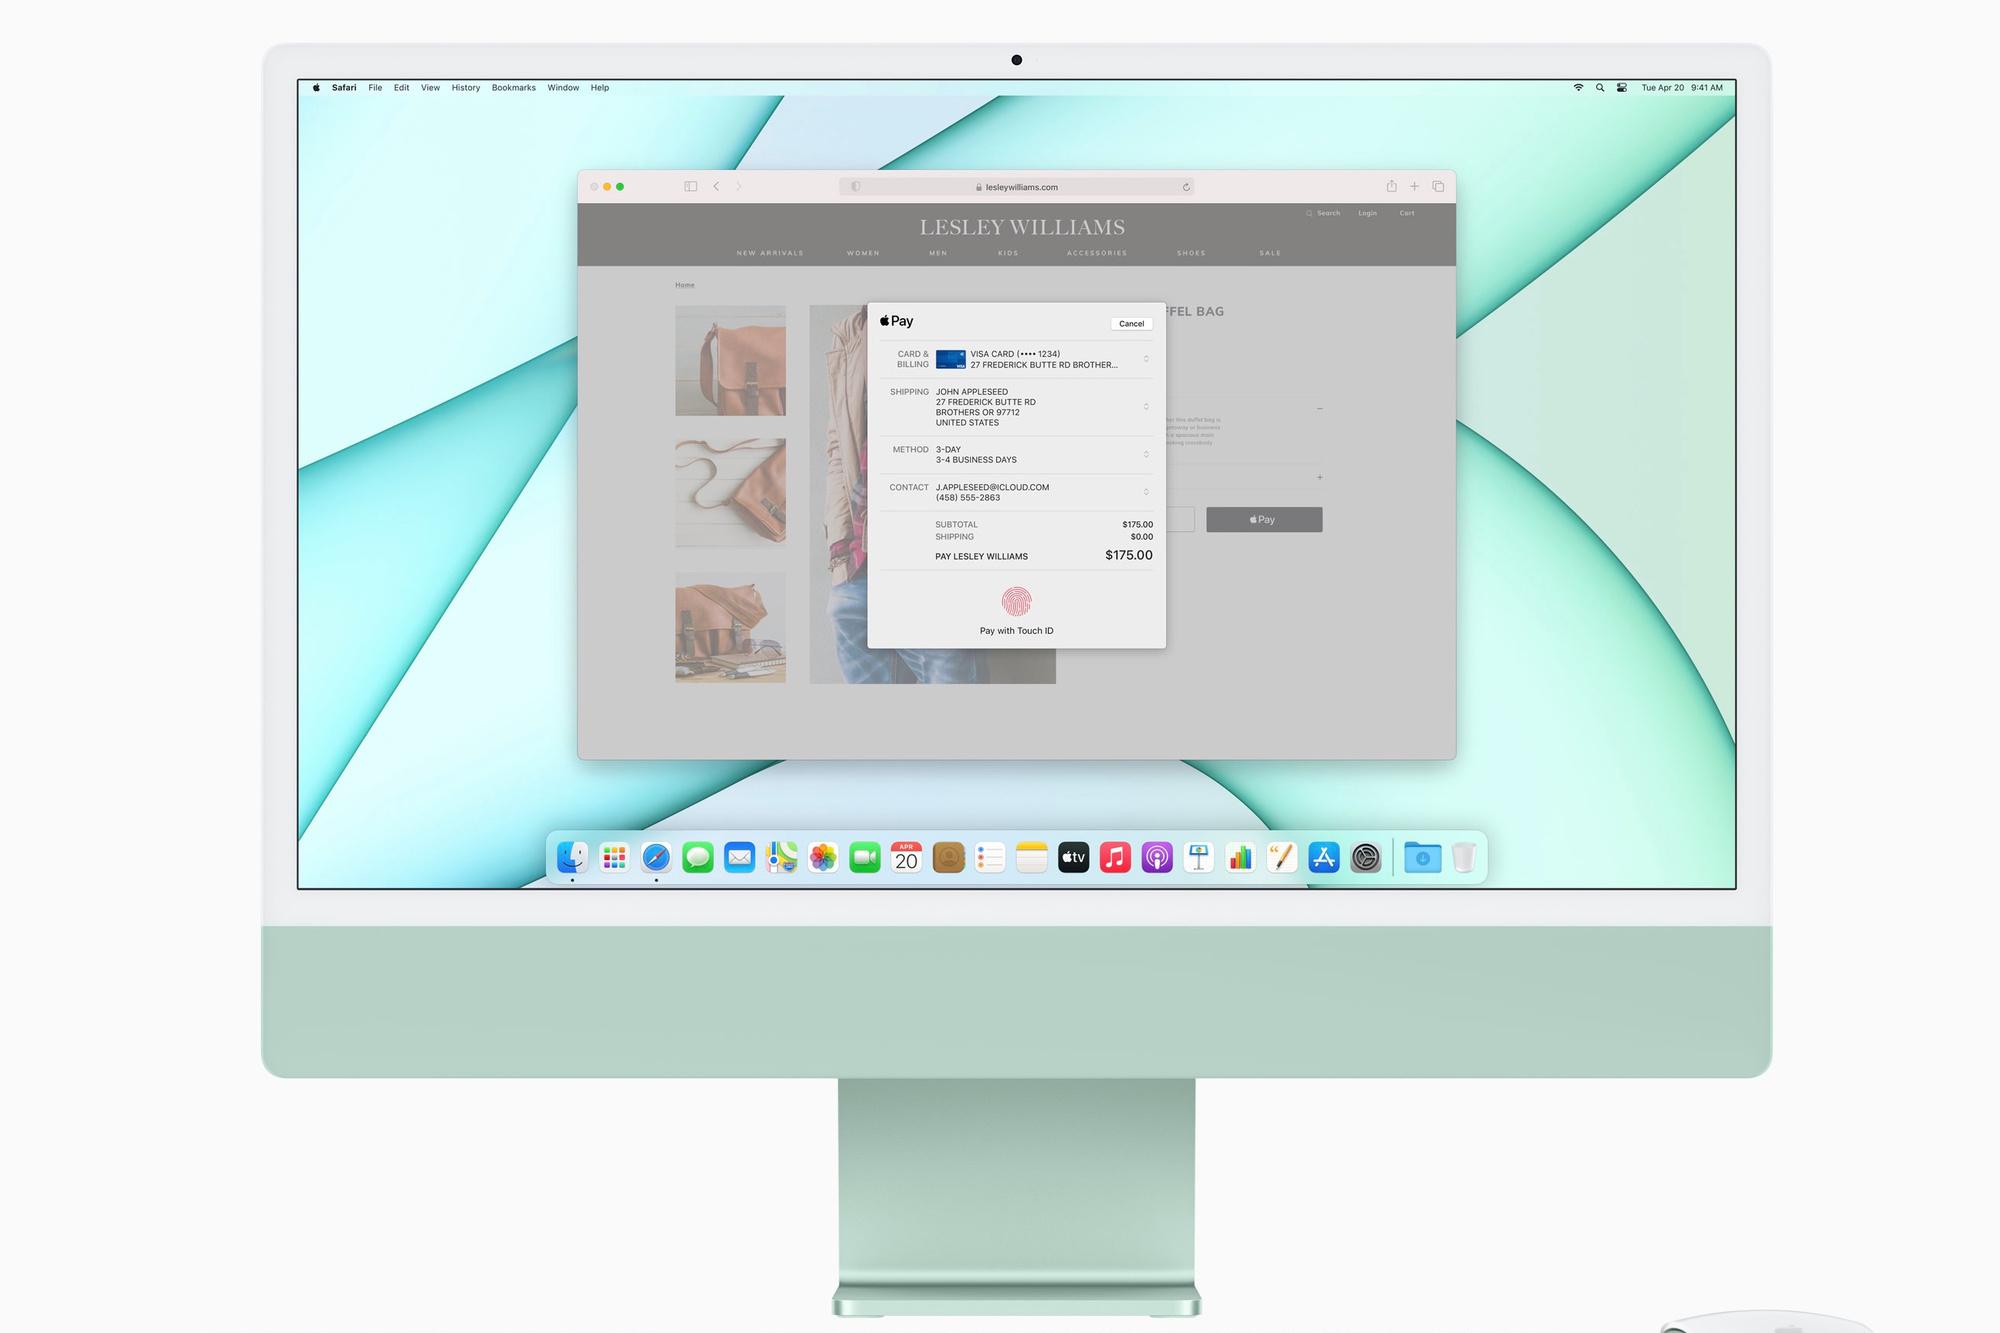 iMac., Apple